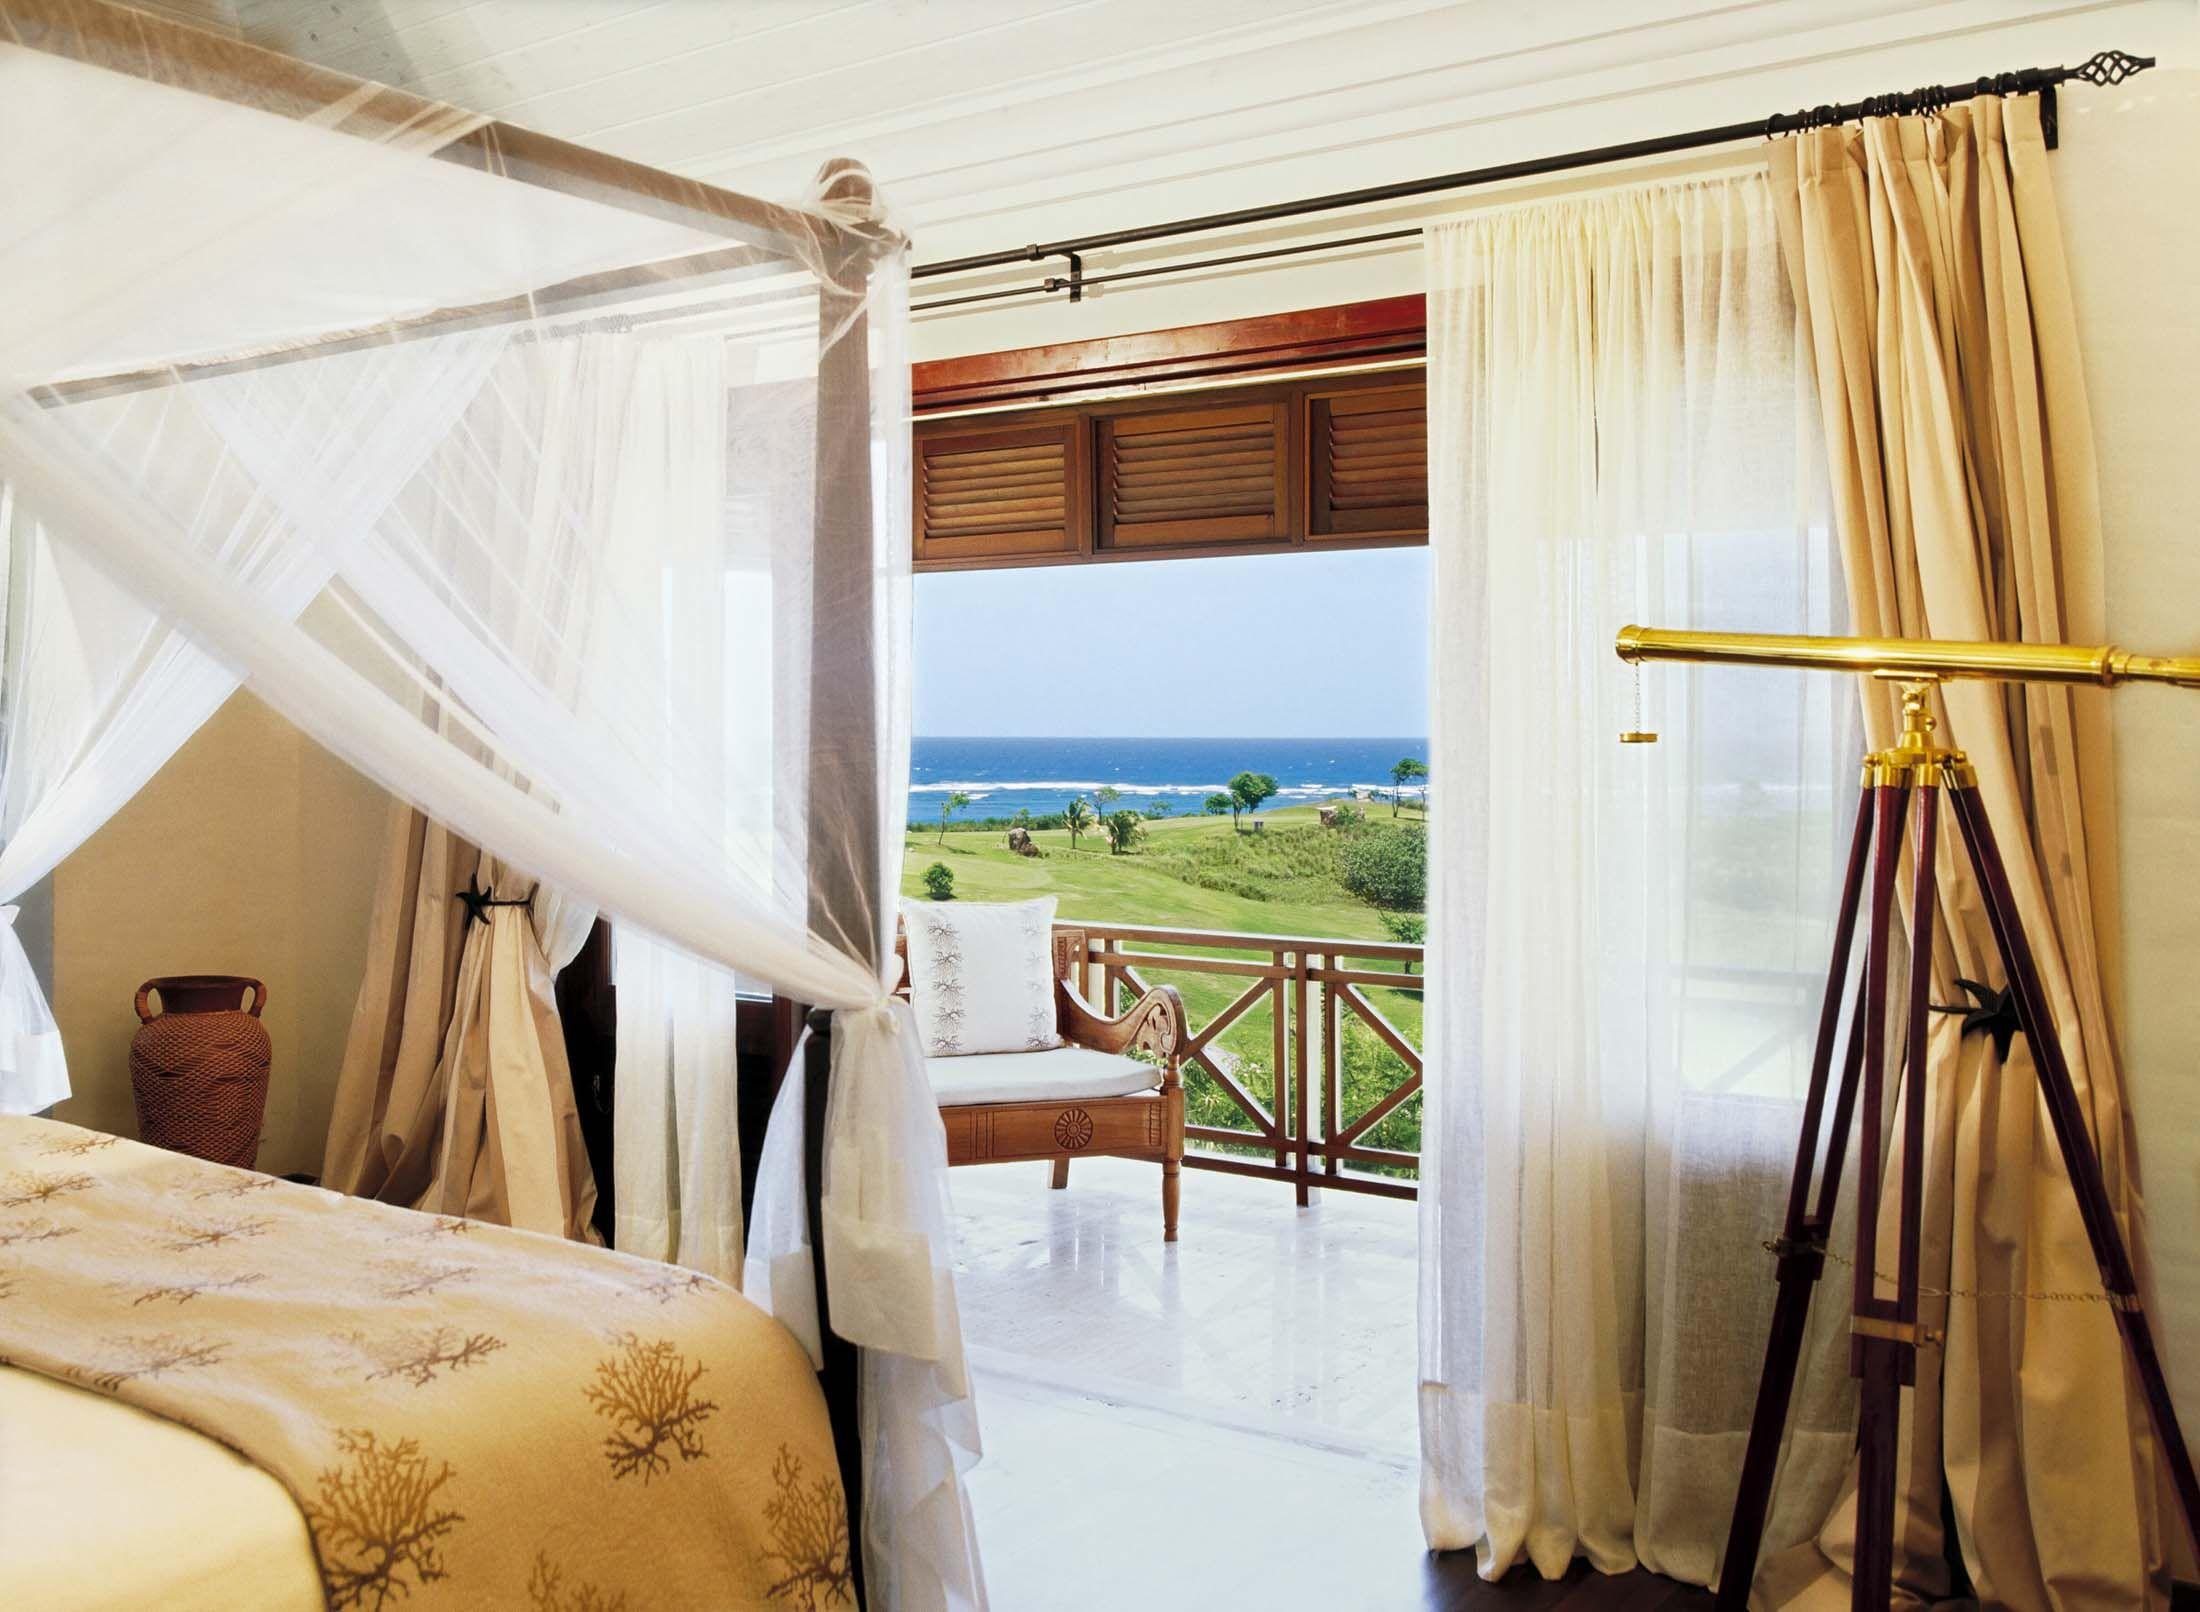 The Caribbean Resort Where Billionaires Go to Escape